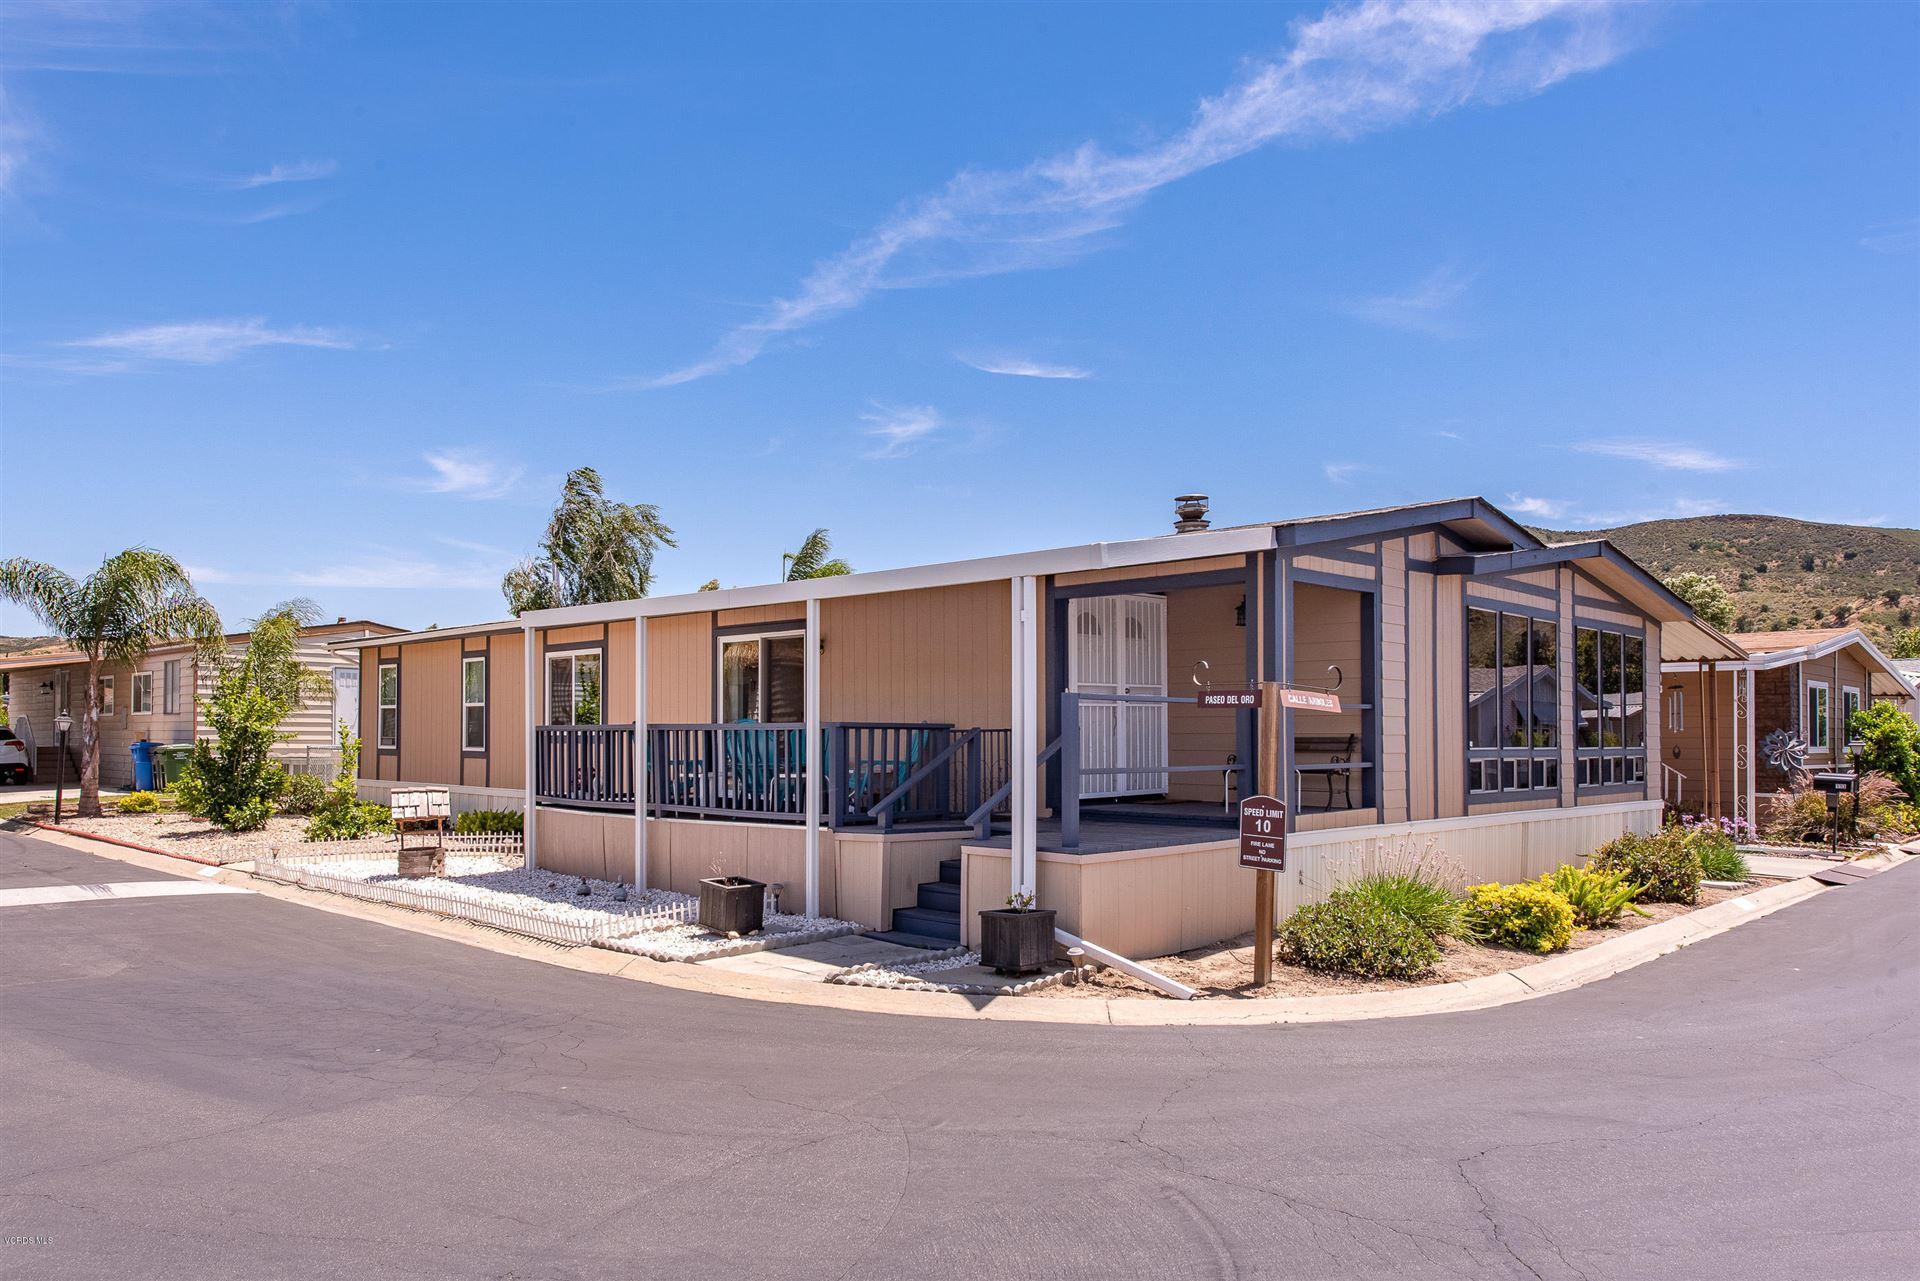 15750 Arroyo Drive #113, Moorpark, CA 93021 - MLS#: 220005915